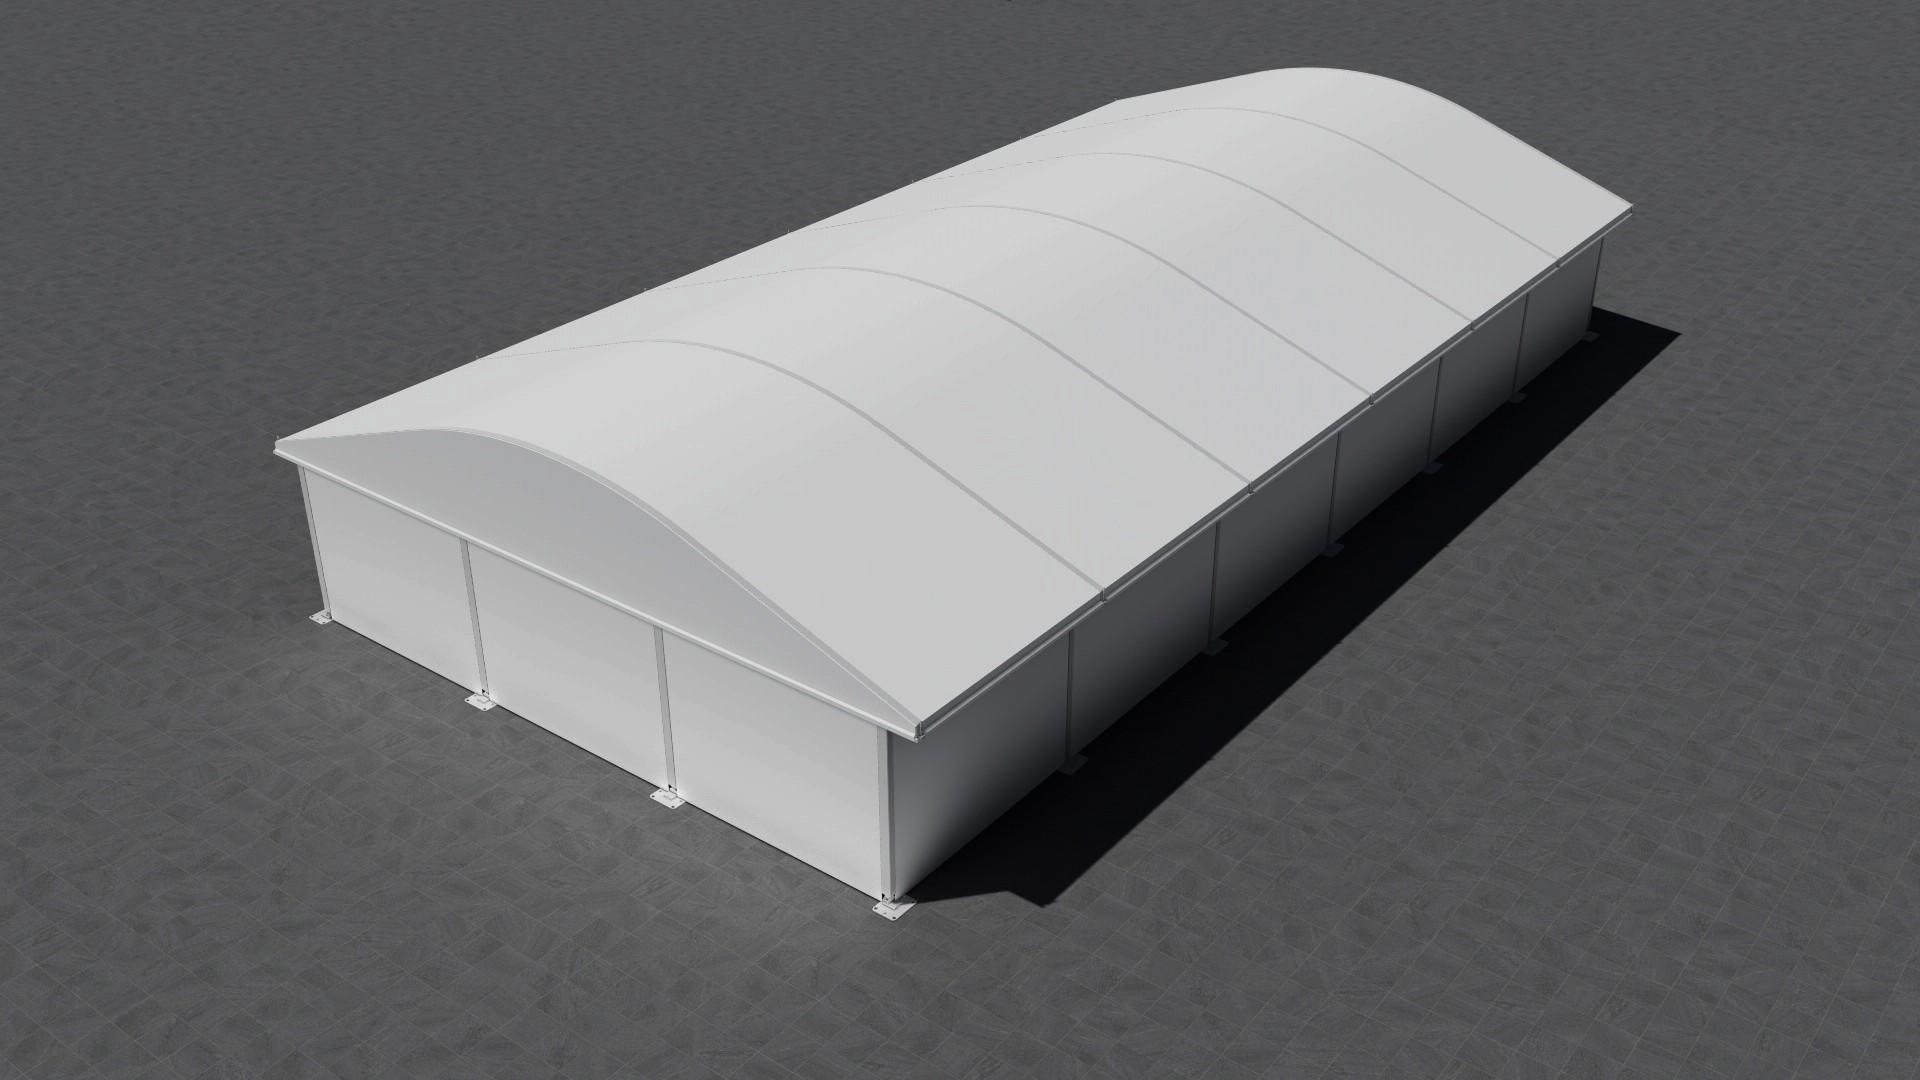 Kaufen Kurve Zelt für temporäre Lager;Kurve Zelt für temporäre Lager Preis;Kurve Zelt für temporäre Lager Marken;Kurve Zelt für temporäre Lager Hersteller;Kurve Zelt für temporäre Lager Zitat;Kurve Zelt für temporäre Lager Unternehmen